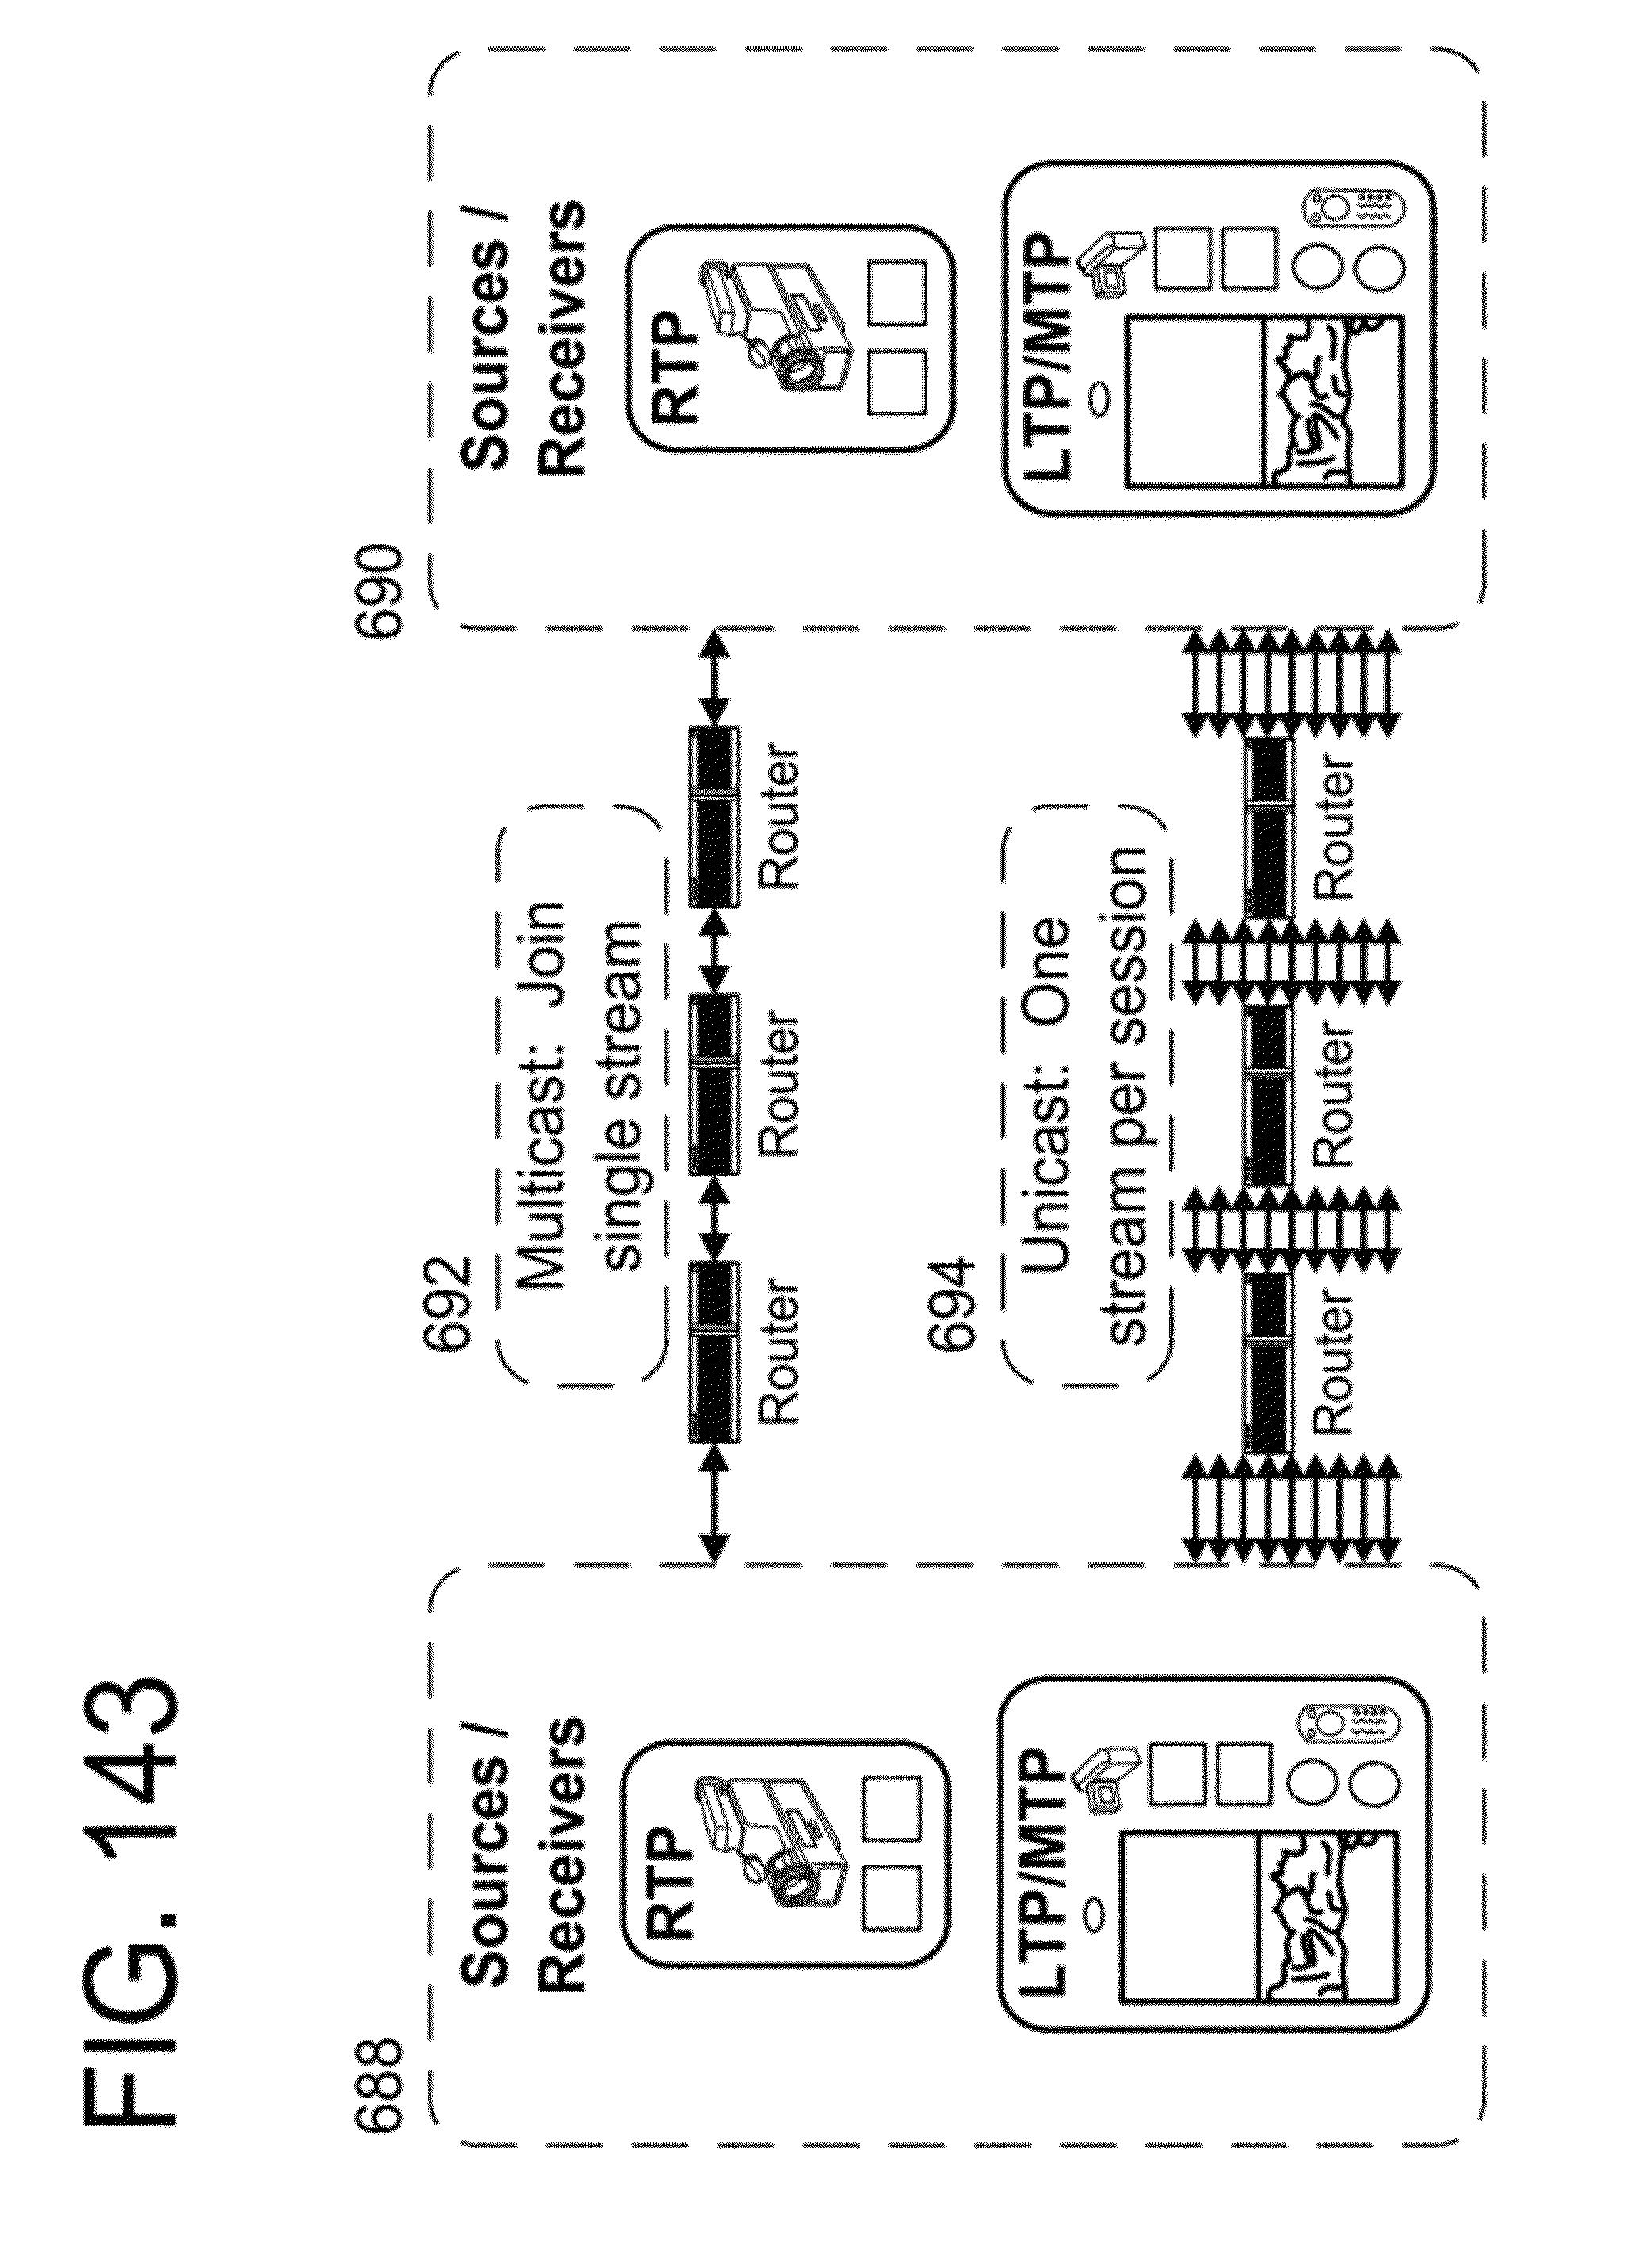 Patent US 9,183,560 B2 on